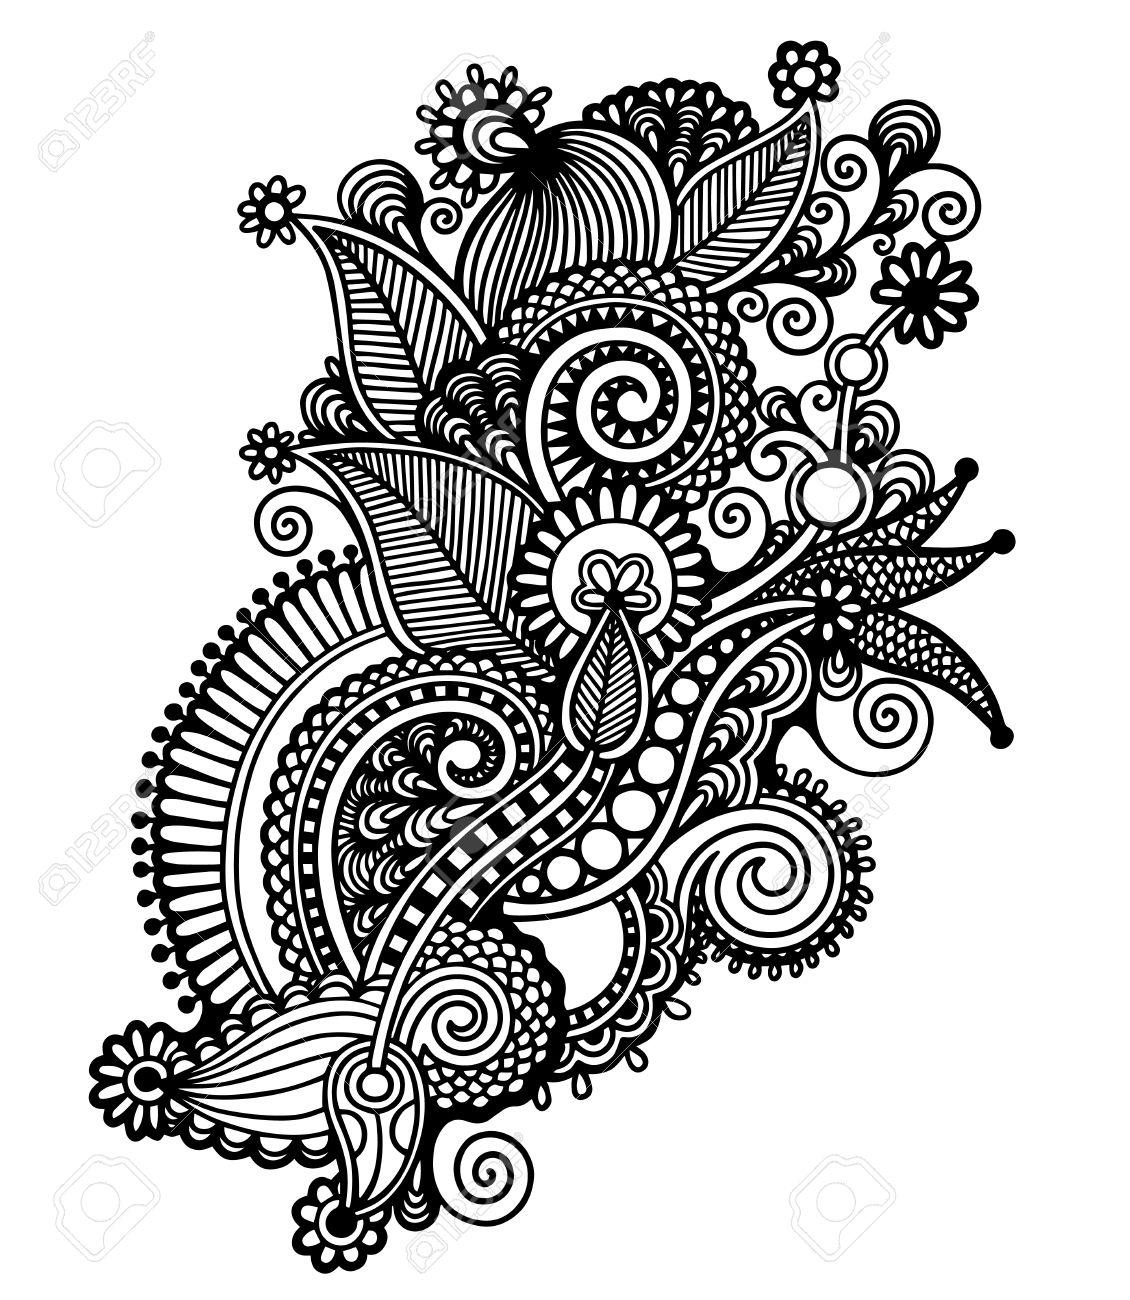 Mano Dibujar La Linea De Diseno De Arte Negro Y Blanco Adornado De